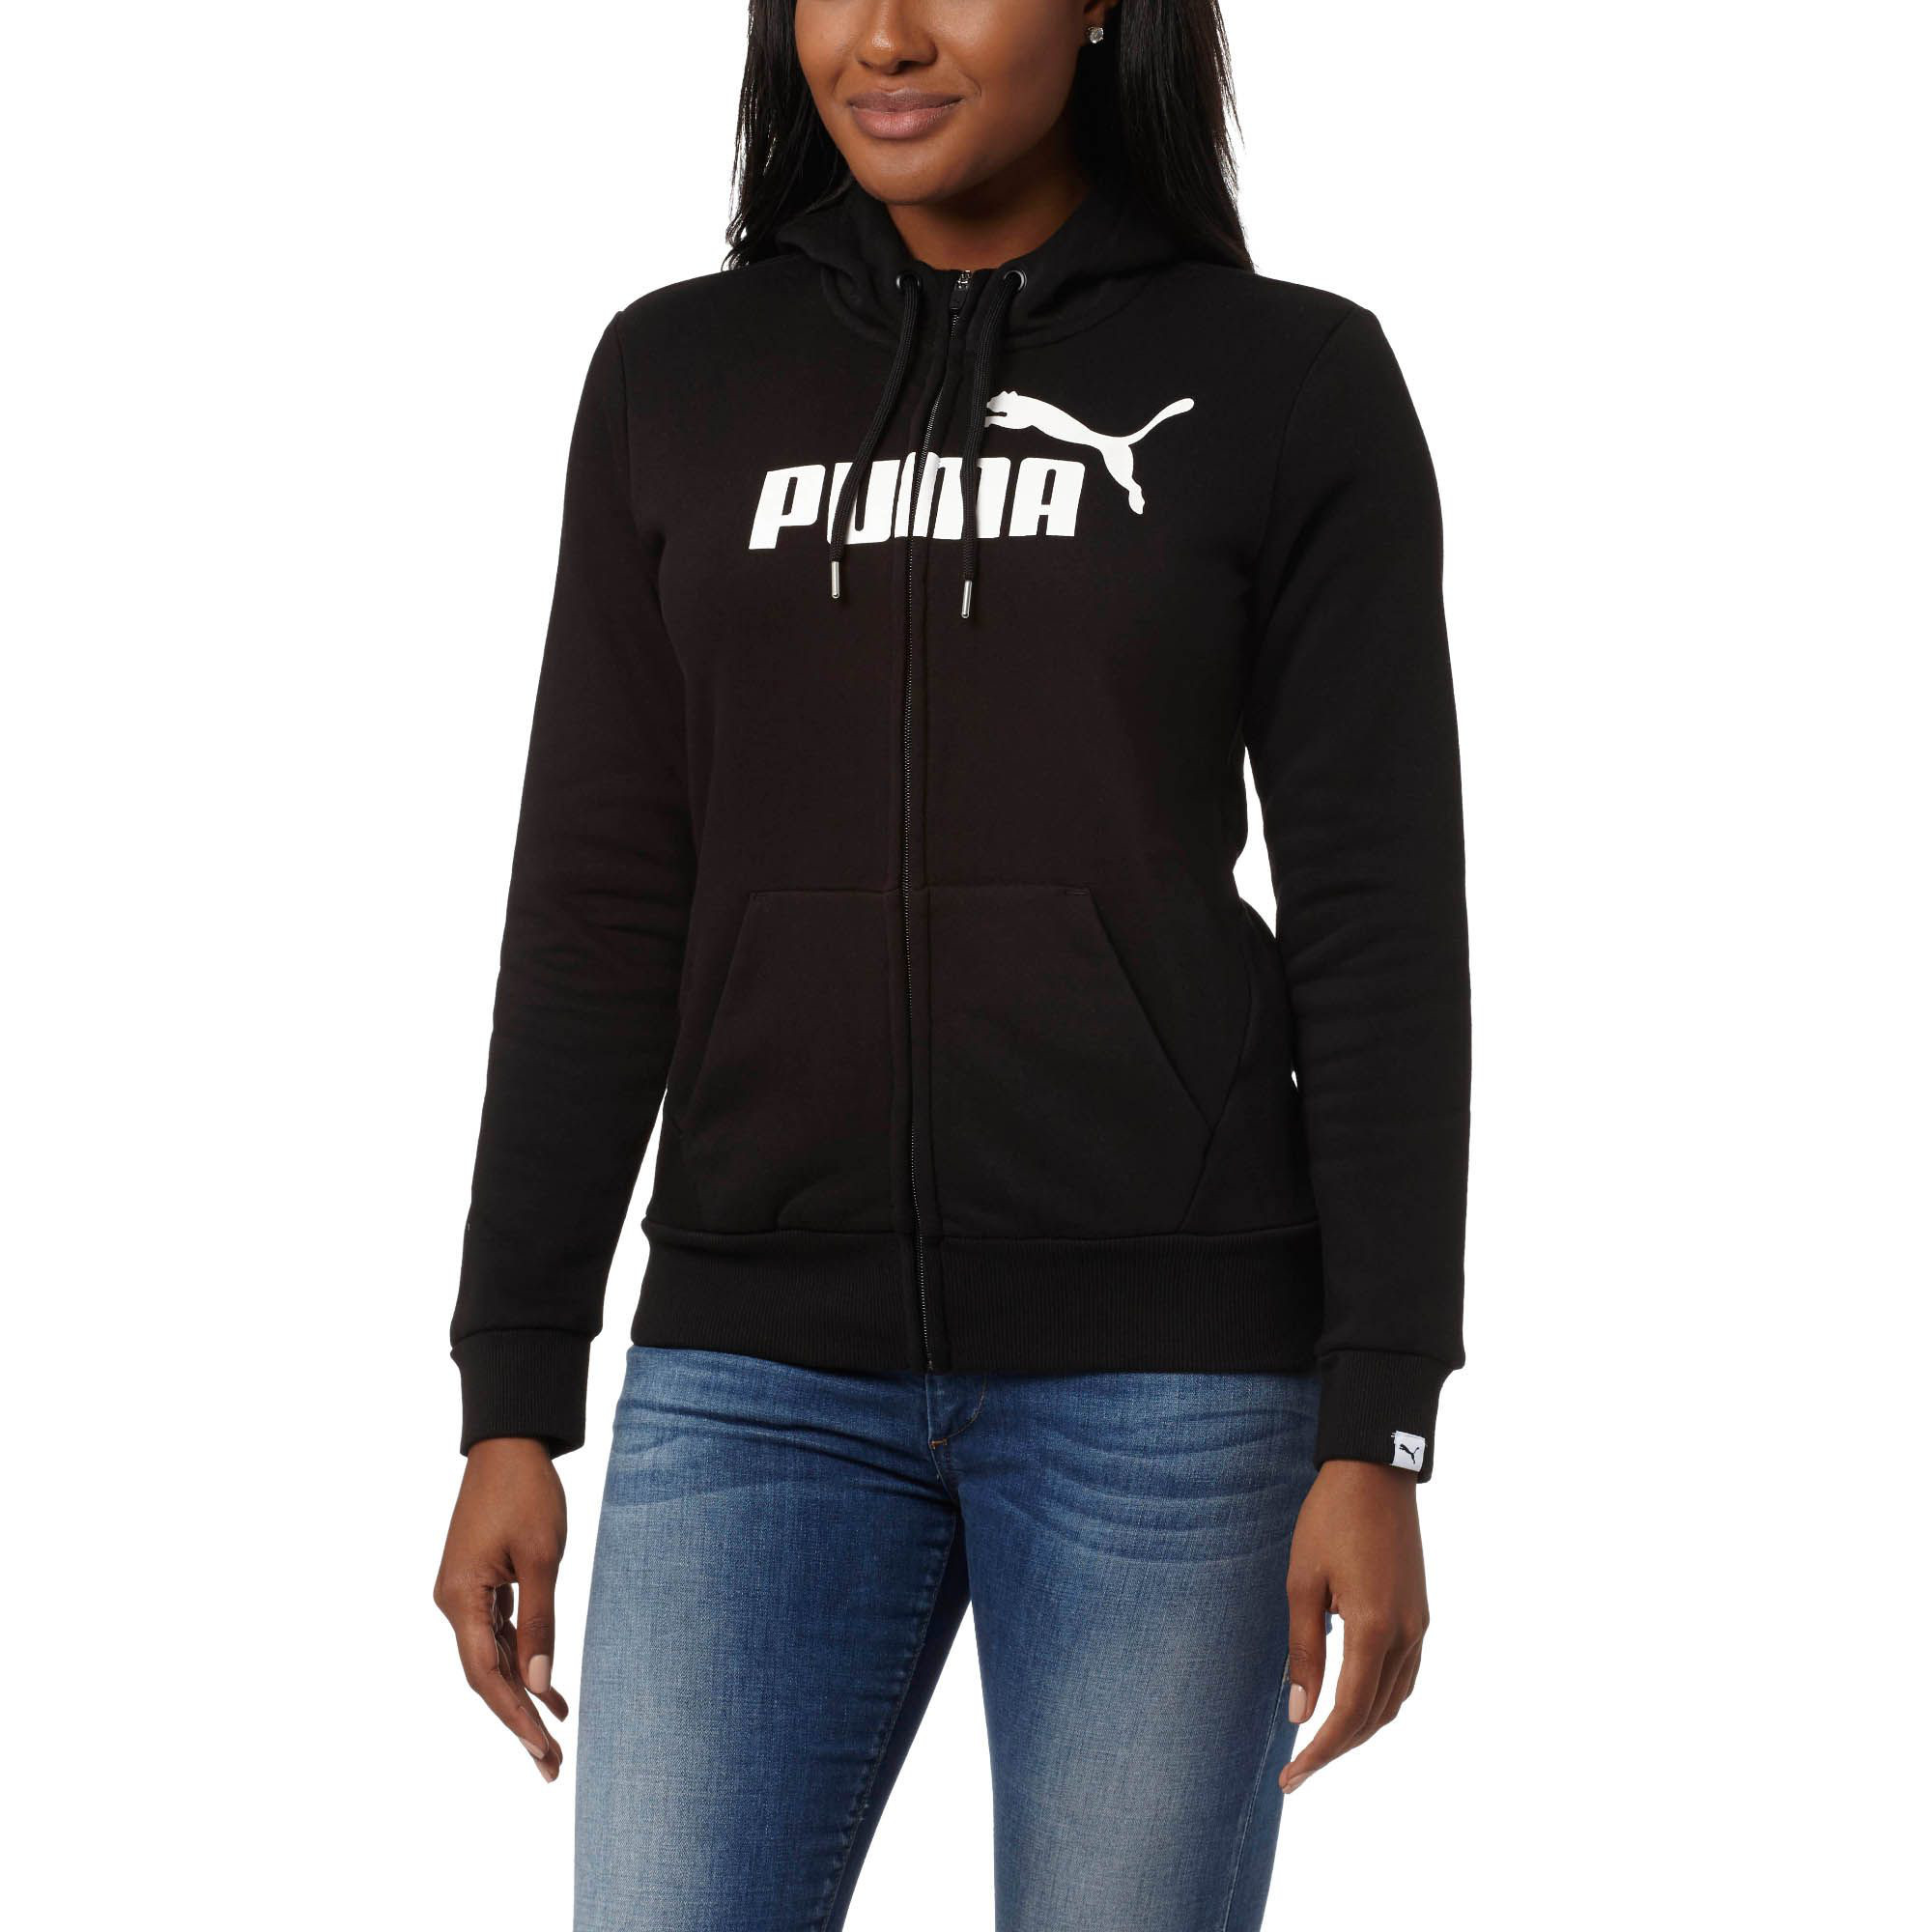 Image Puma Women's Essential No. 1 Zip-Up Hoodie #2